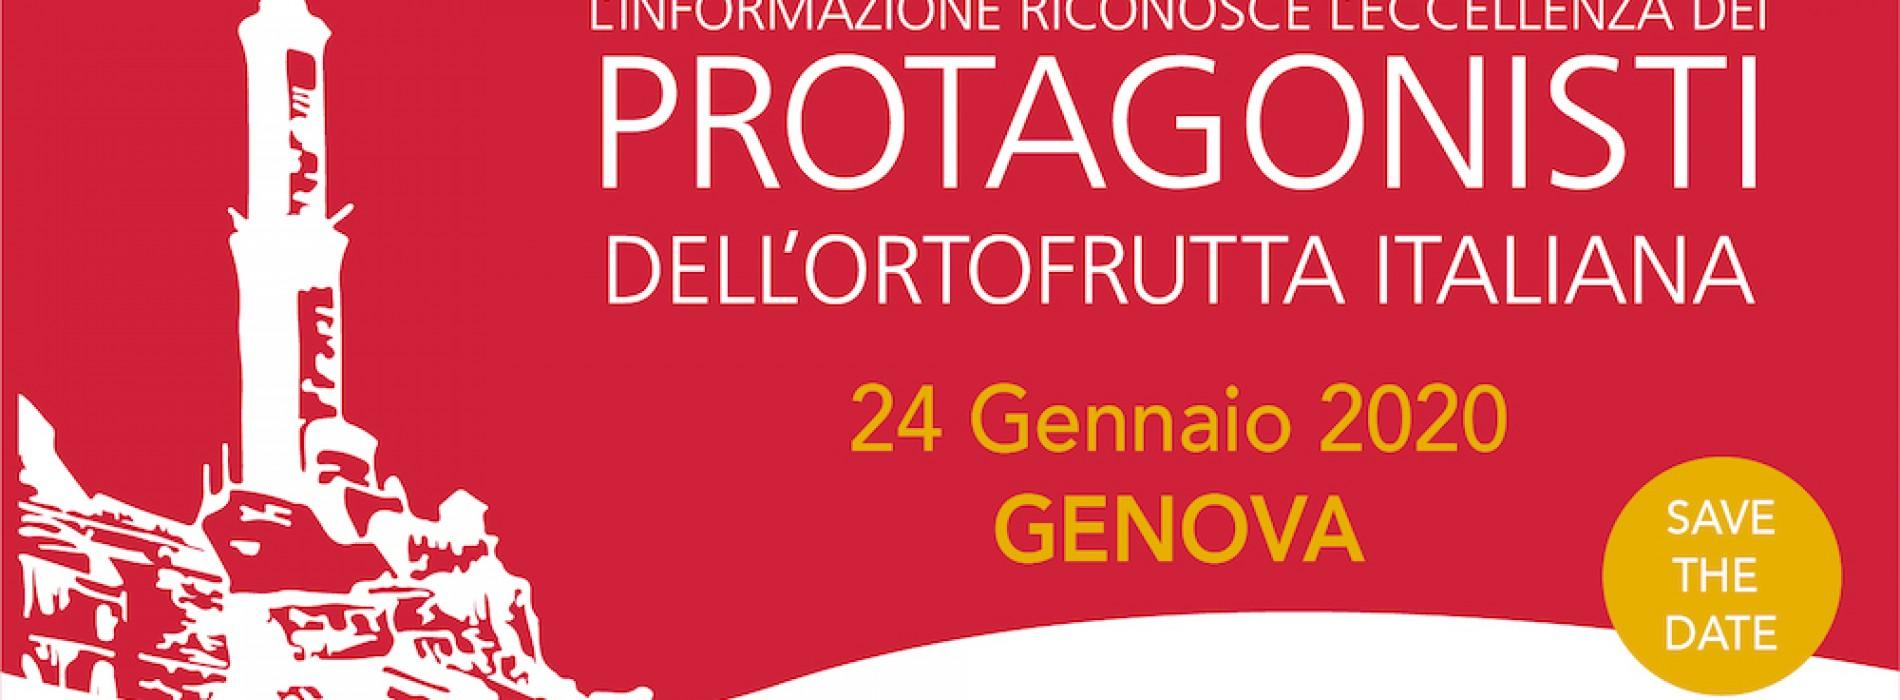 PROTAGONISTI DELL'ORTOFRUTTA A GENOVA, FEDAGRO PARTNER